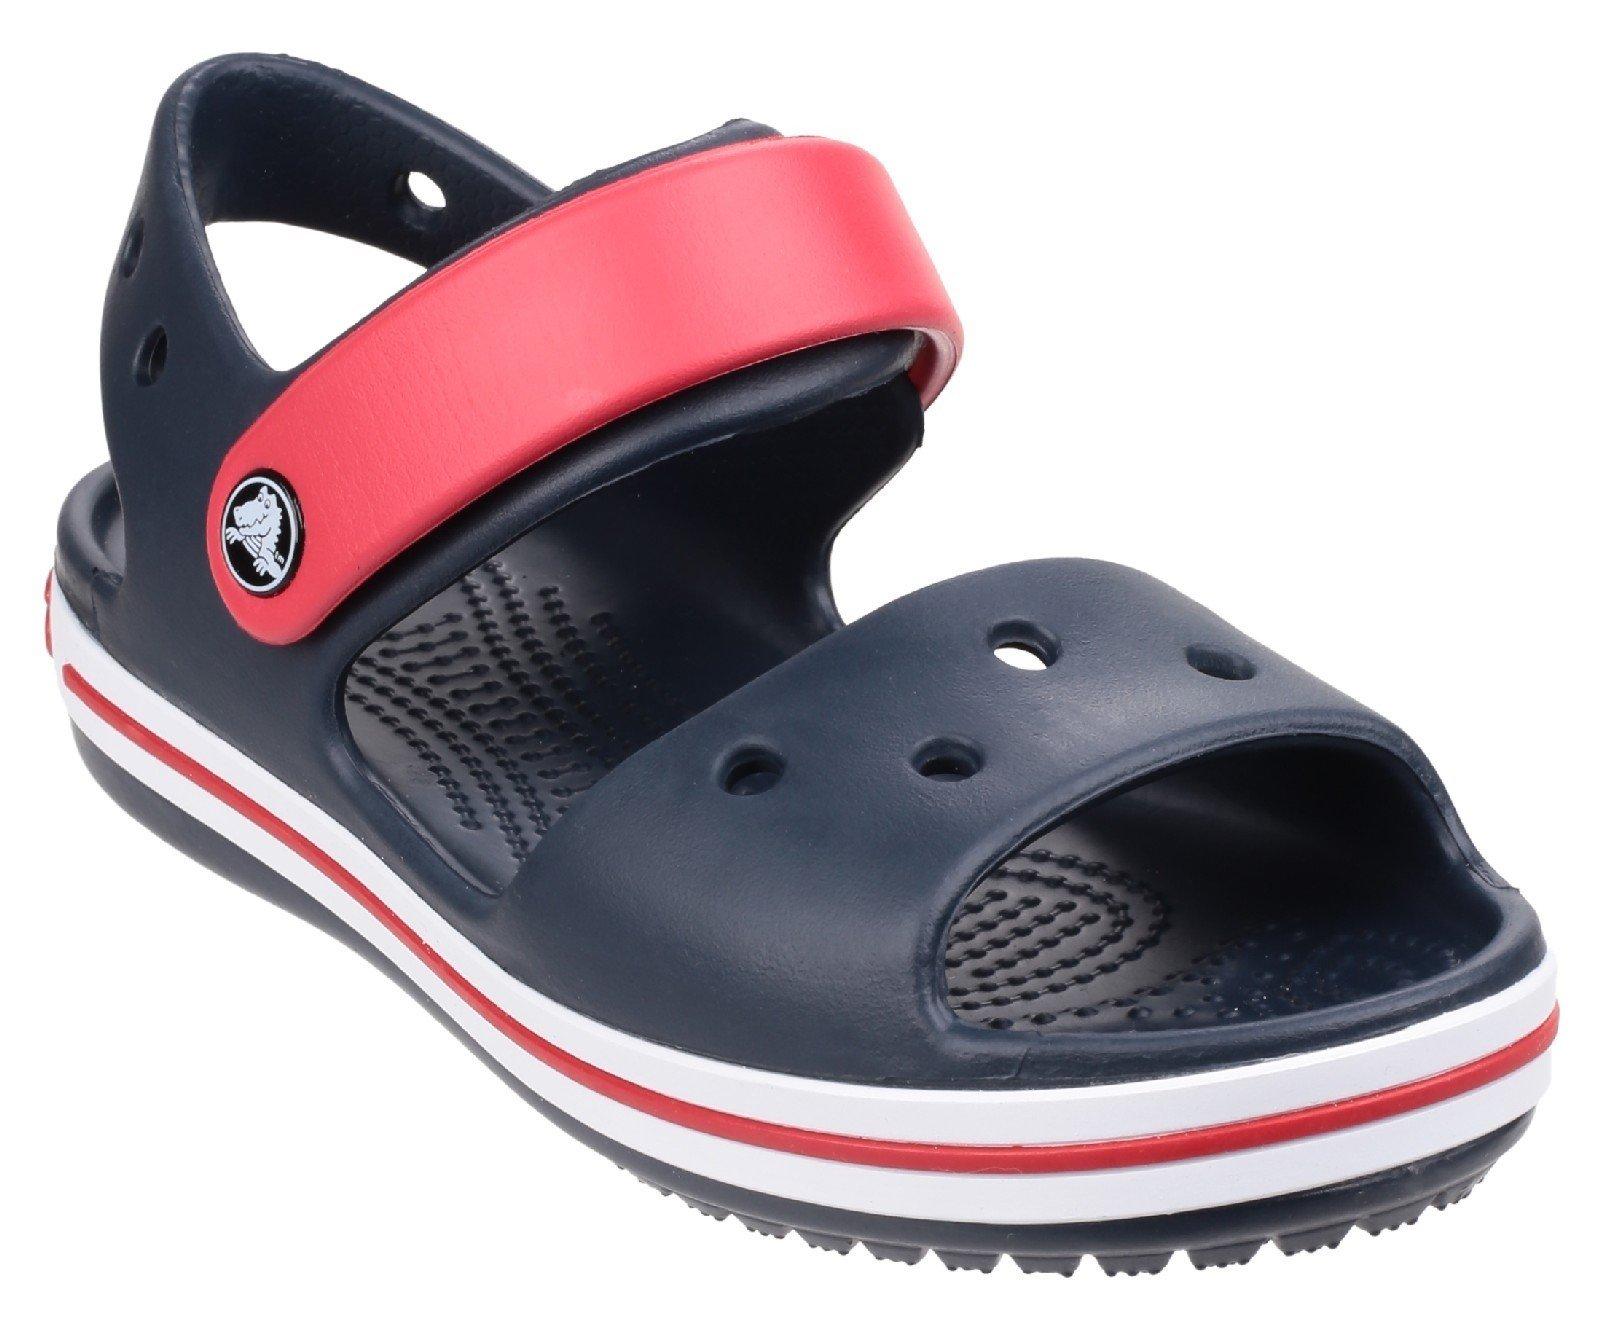 Crocs Kid's Sandal Various Colours 21077 - Navy/Red/White 5